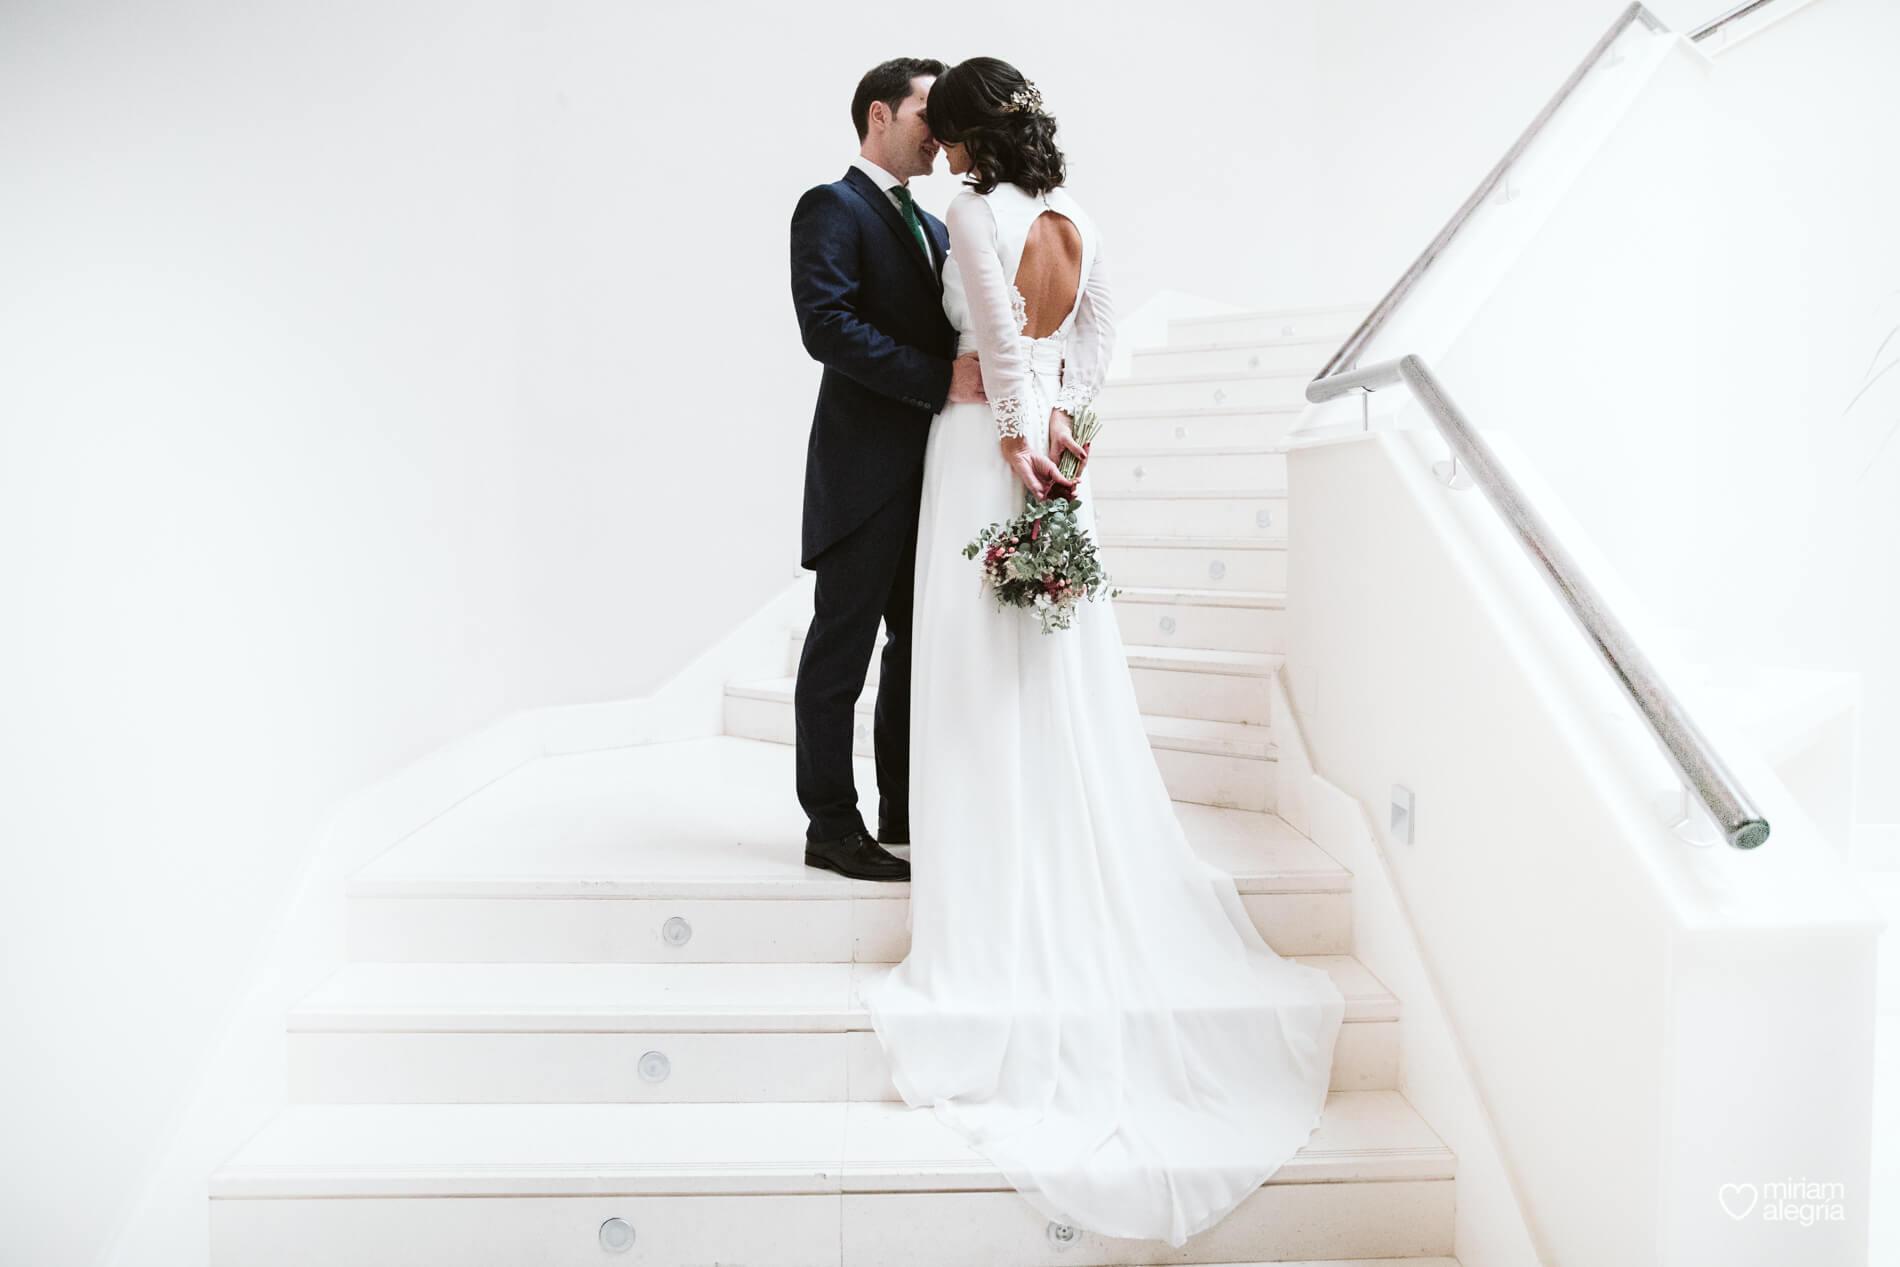 boda-en-iglesia-del-carmen-cartagena-122